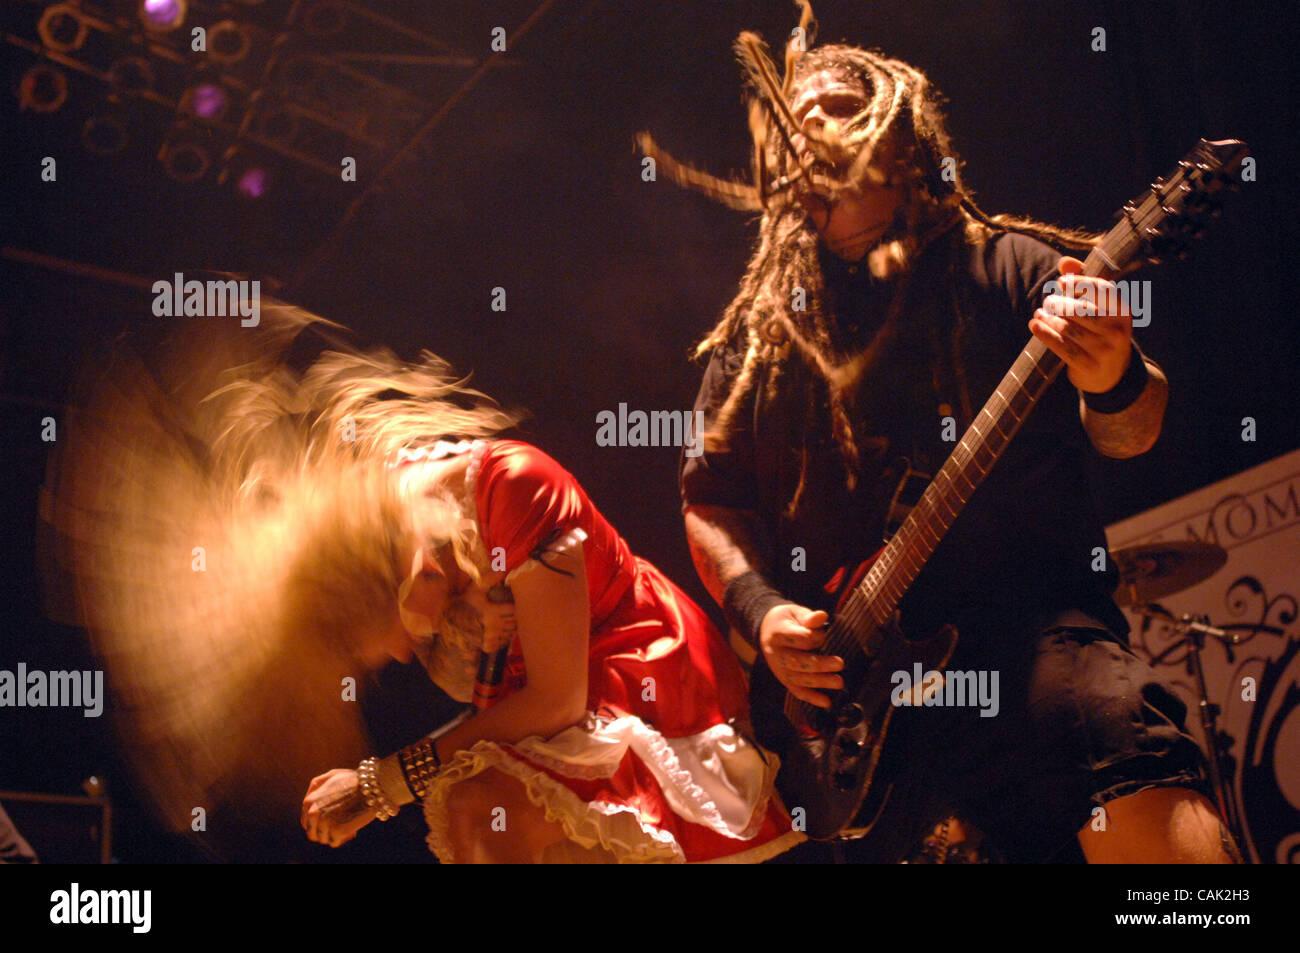 guitarist chris howorth in performs stock photos guitarist chris